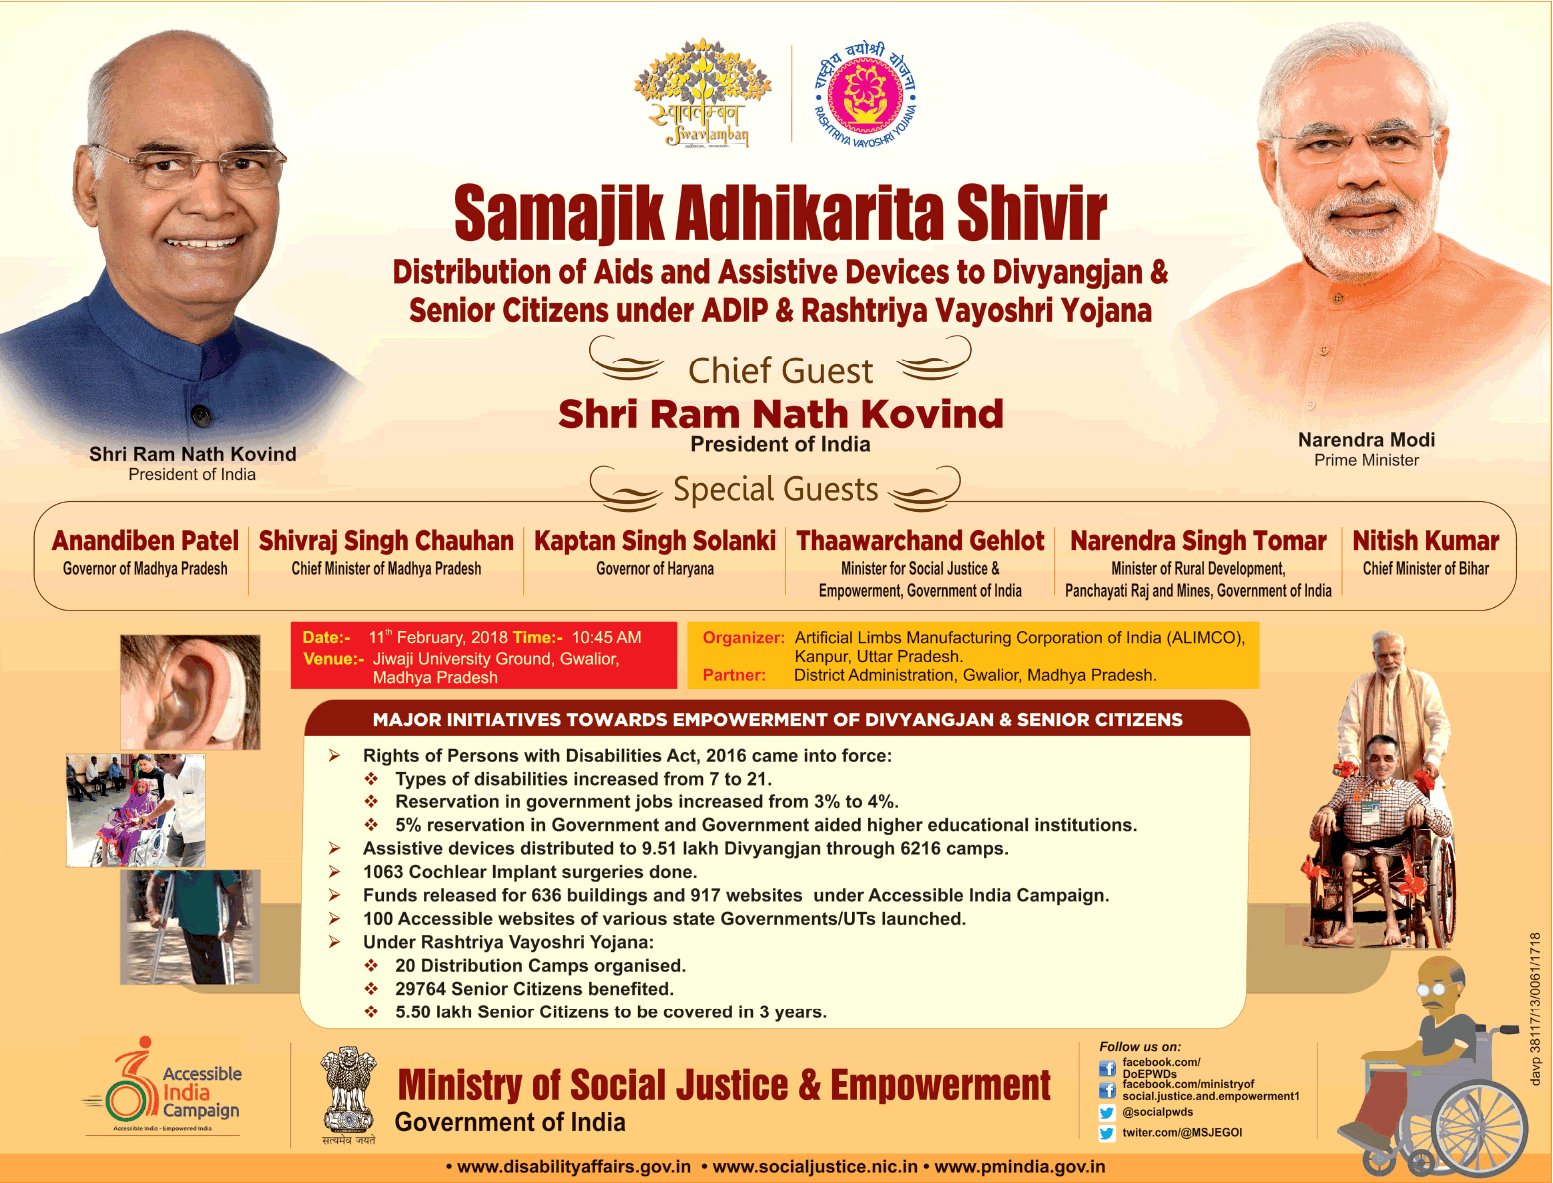 Samajik Adhikarita Shivir Distribution Of Aids And Assistive Devices Ad